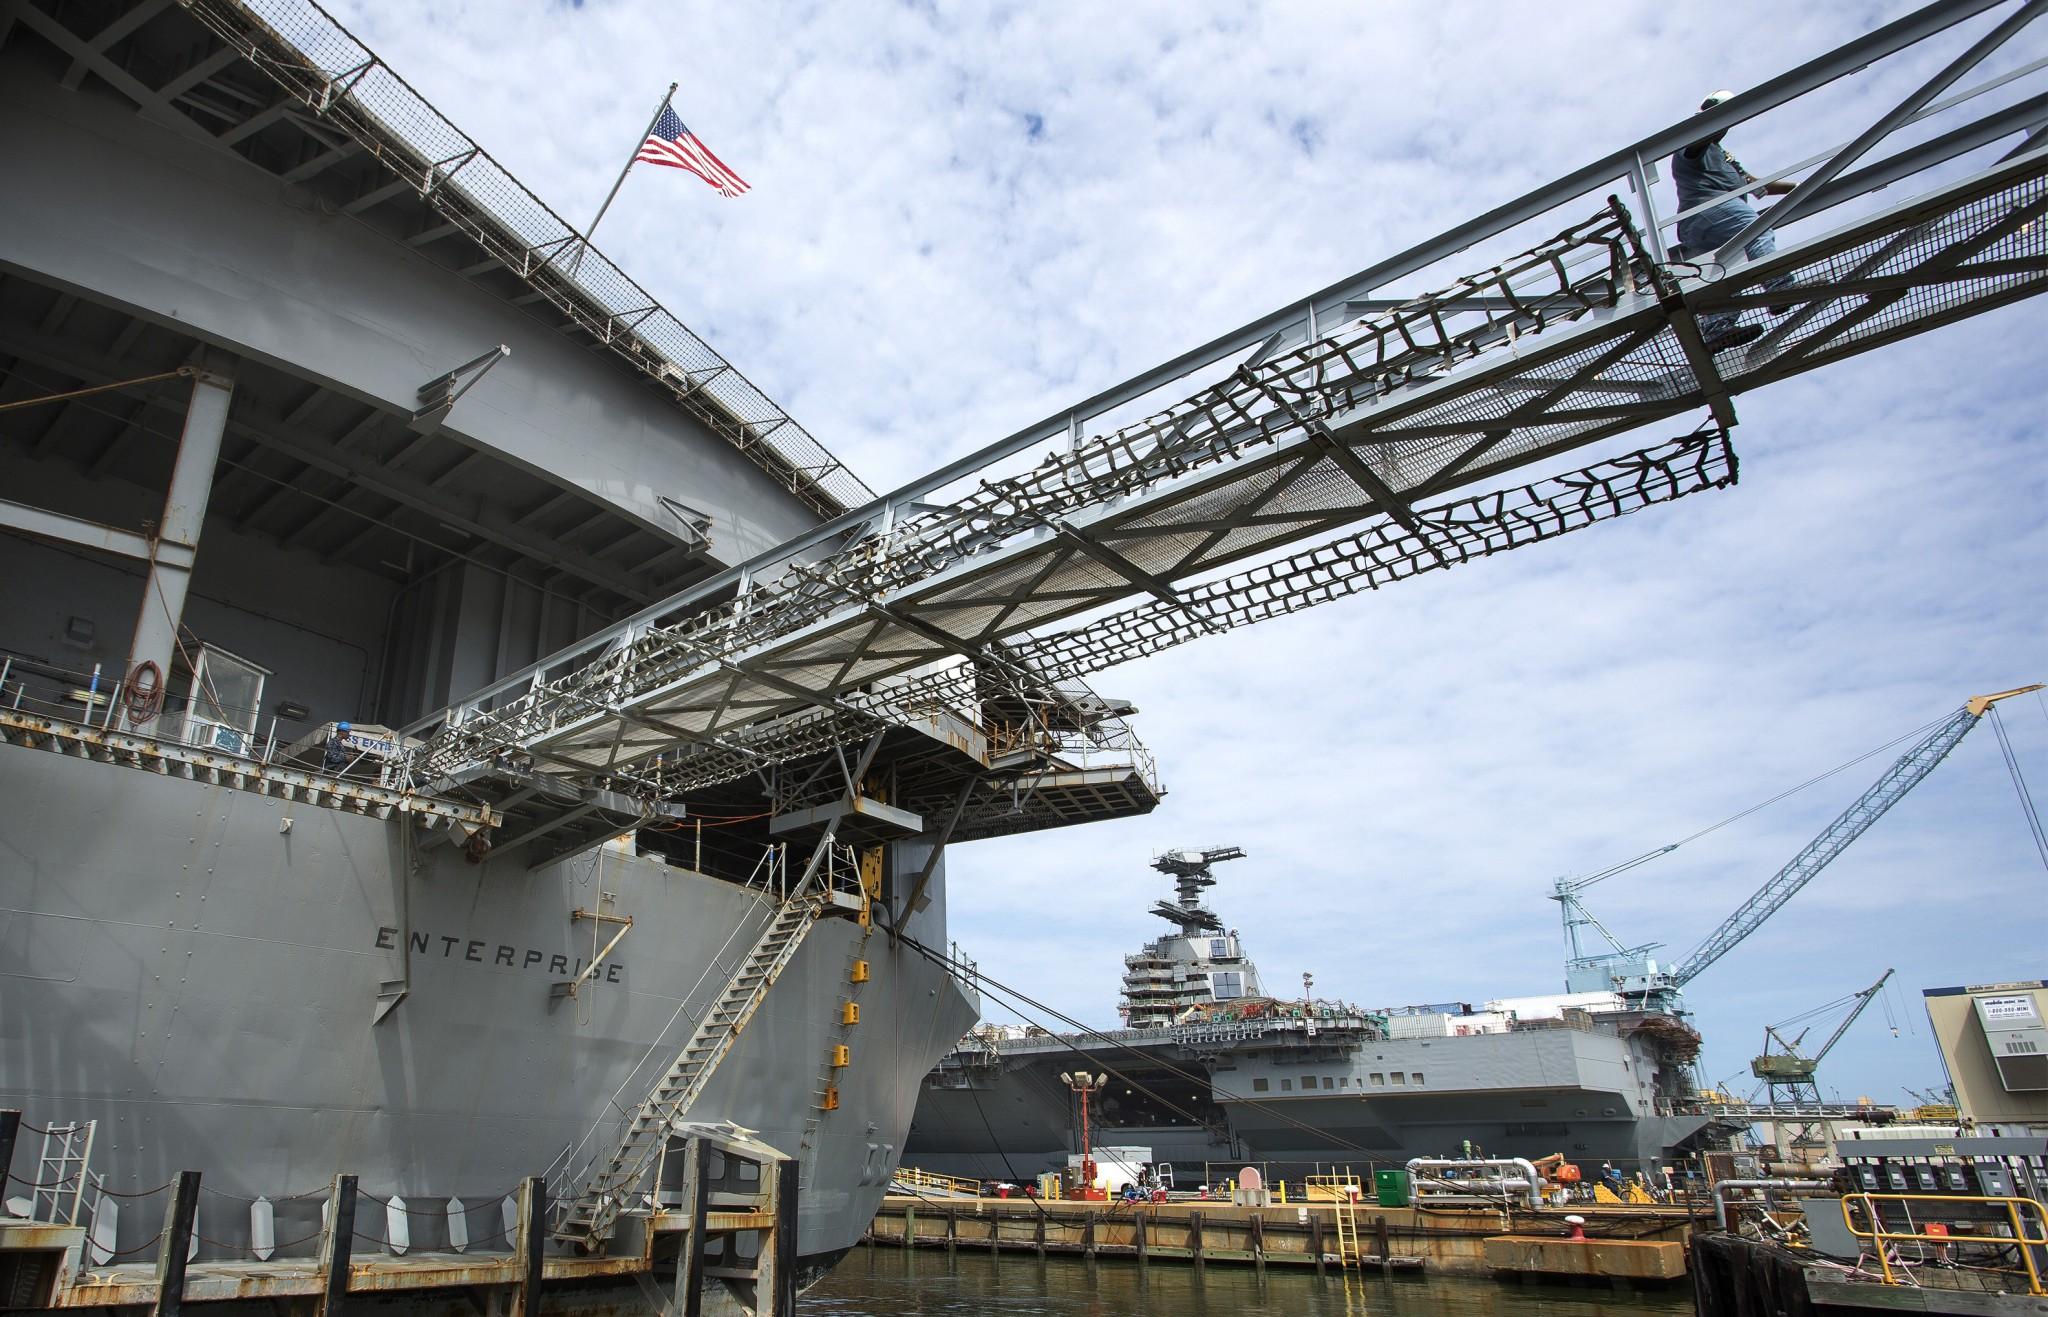 Flugzeugträger in Newport News Bild: Newport News Shipbuilding